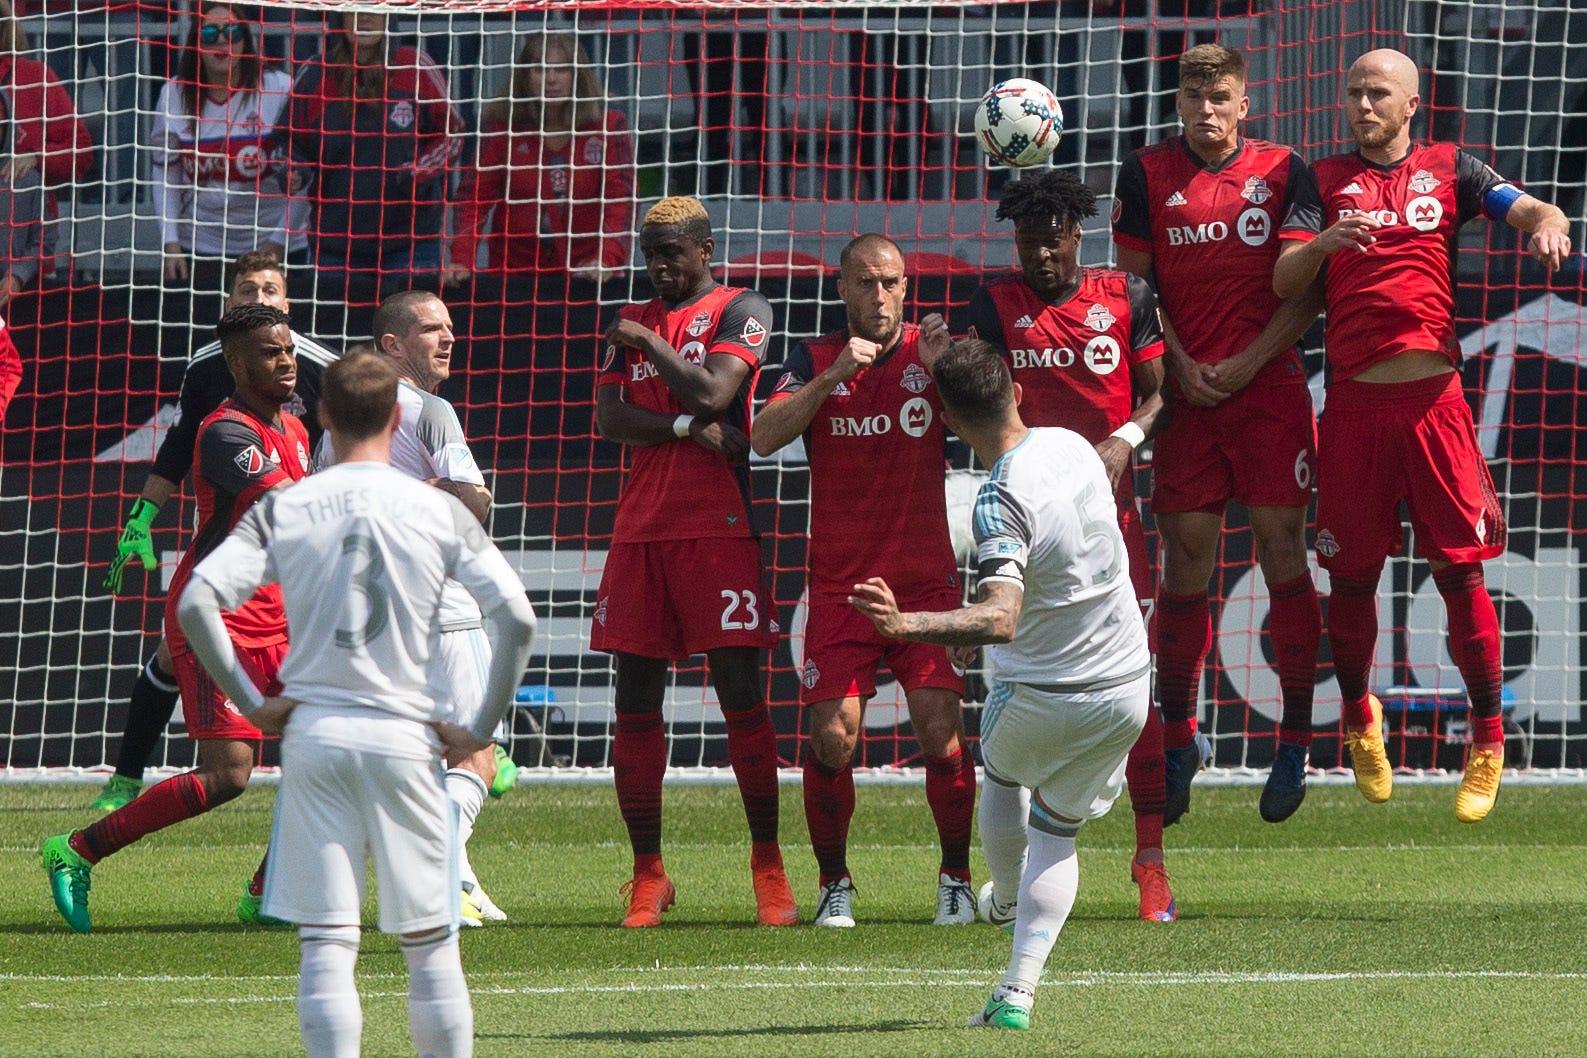 Toronto FC beats Minnesota United 3-2 for 6th straight win